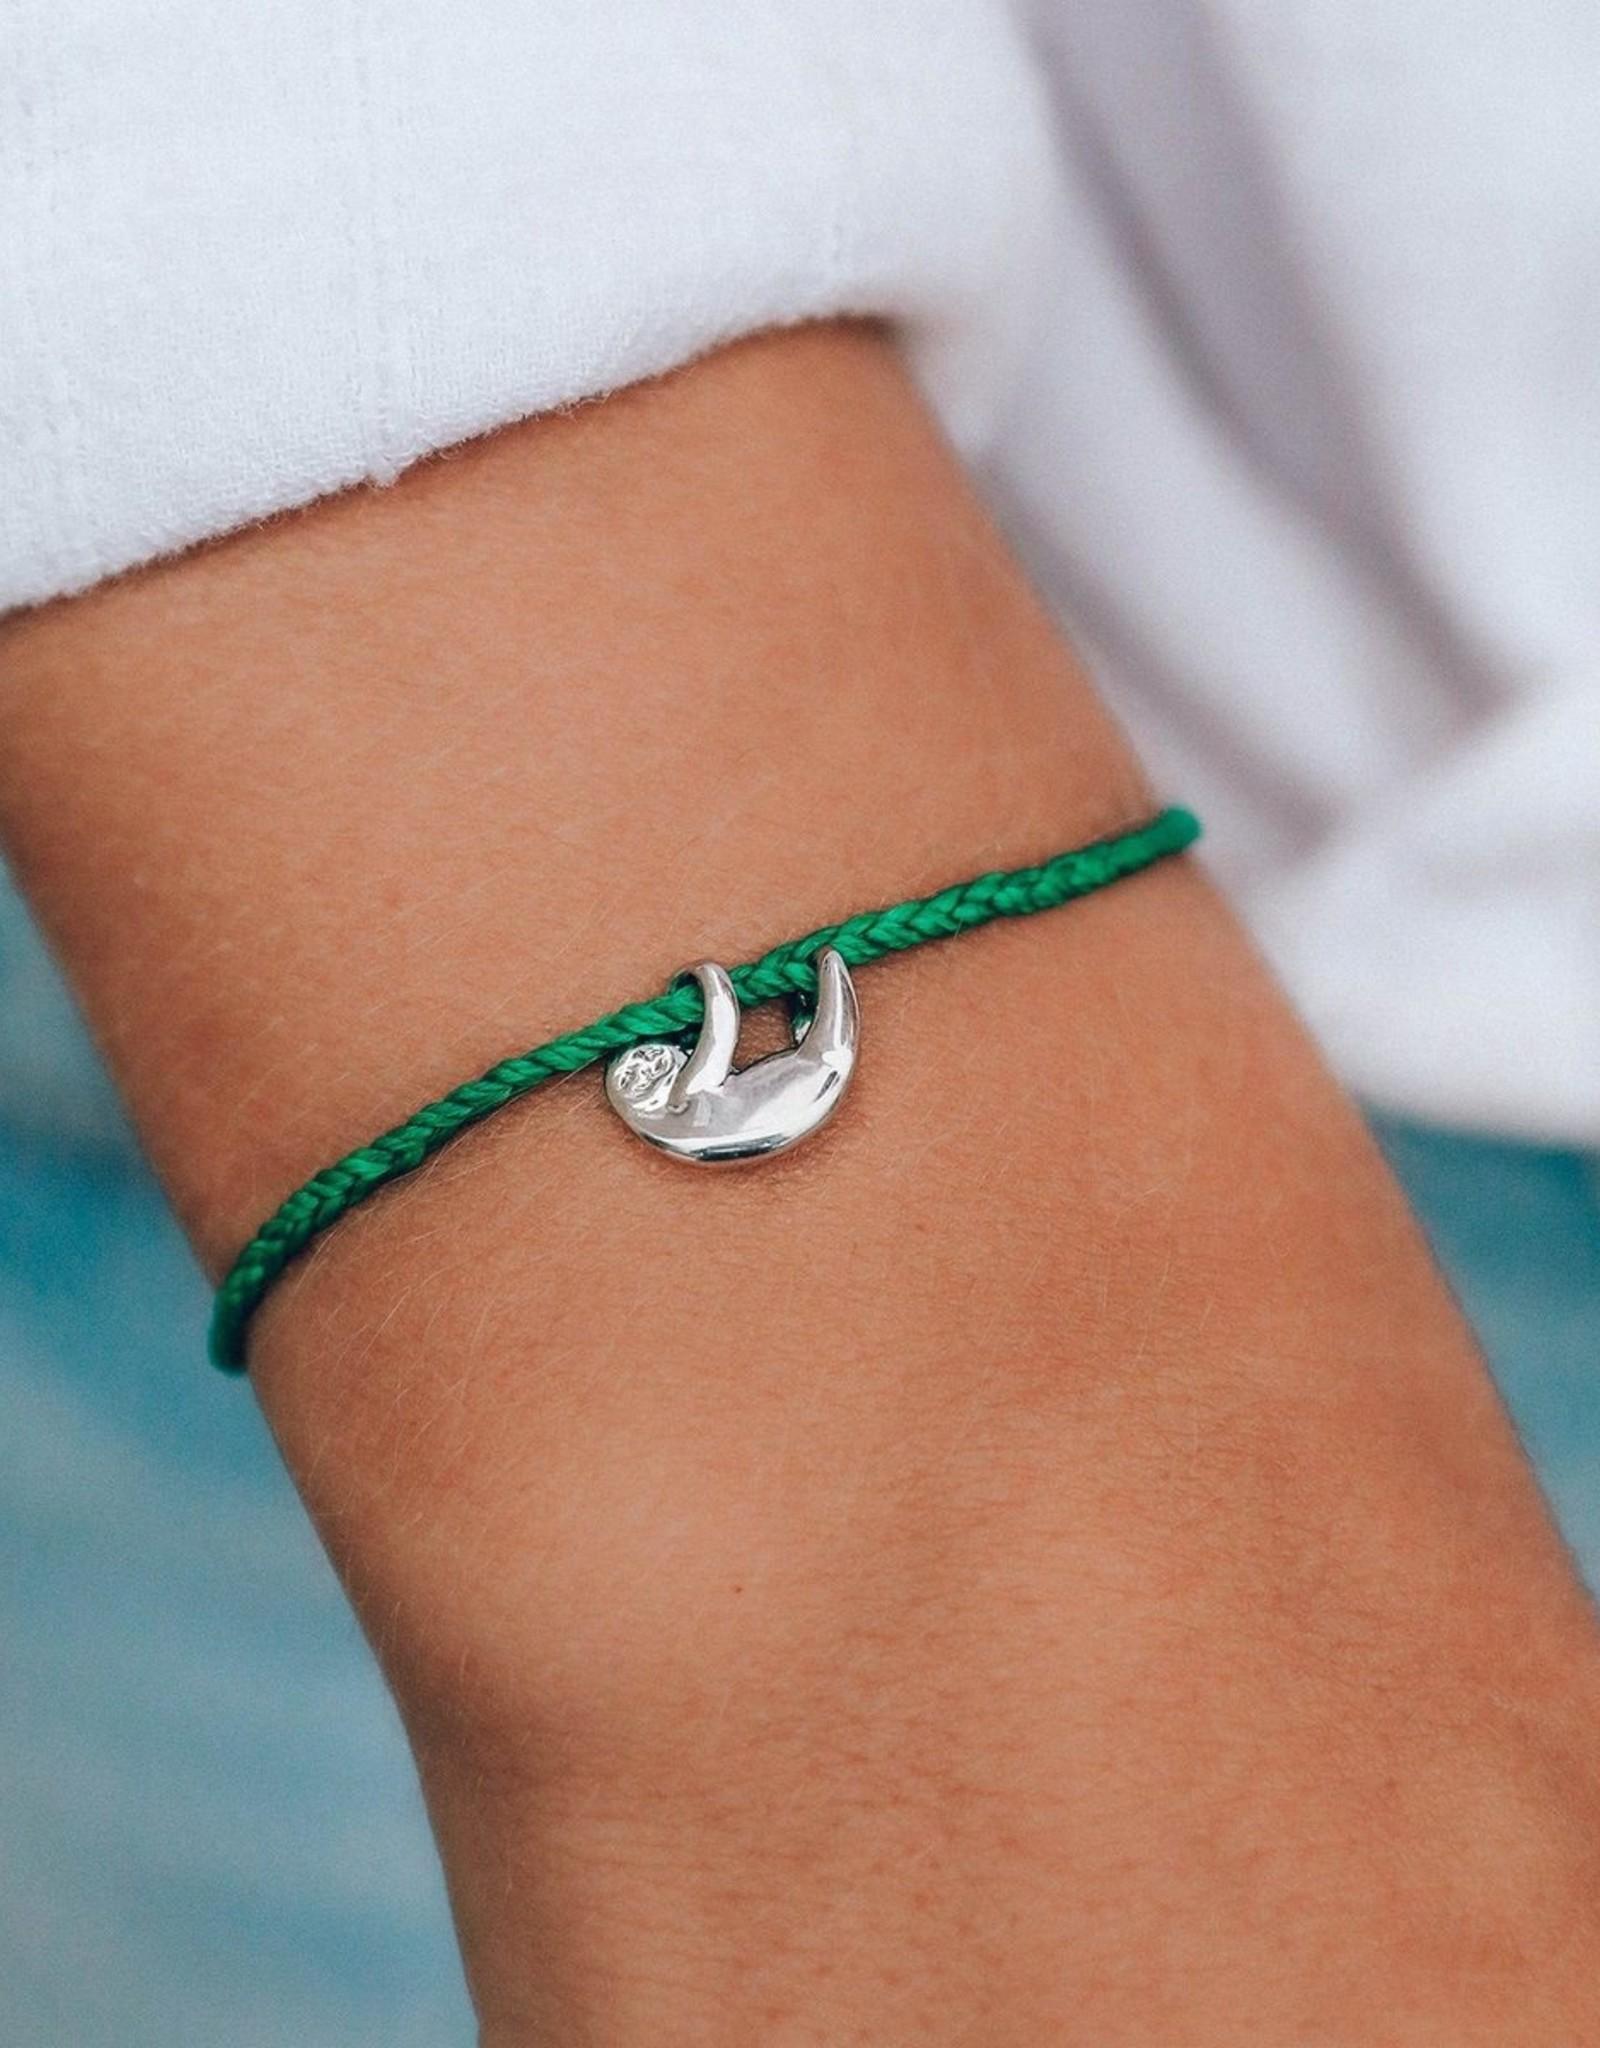 Pura Vida Pura Vida - Charm Bracelet Sloth - Dark Green